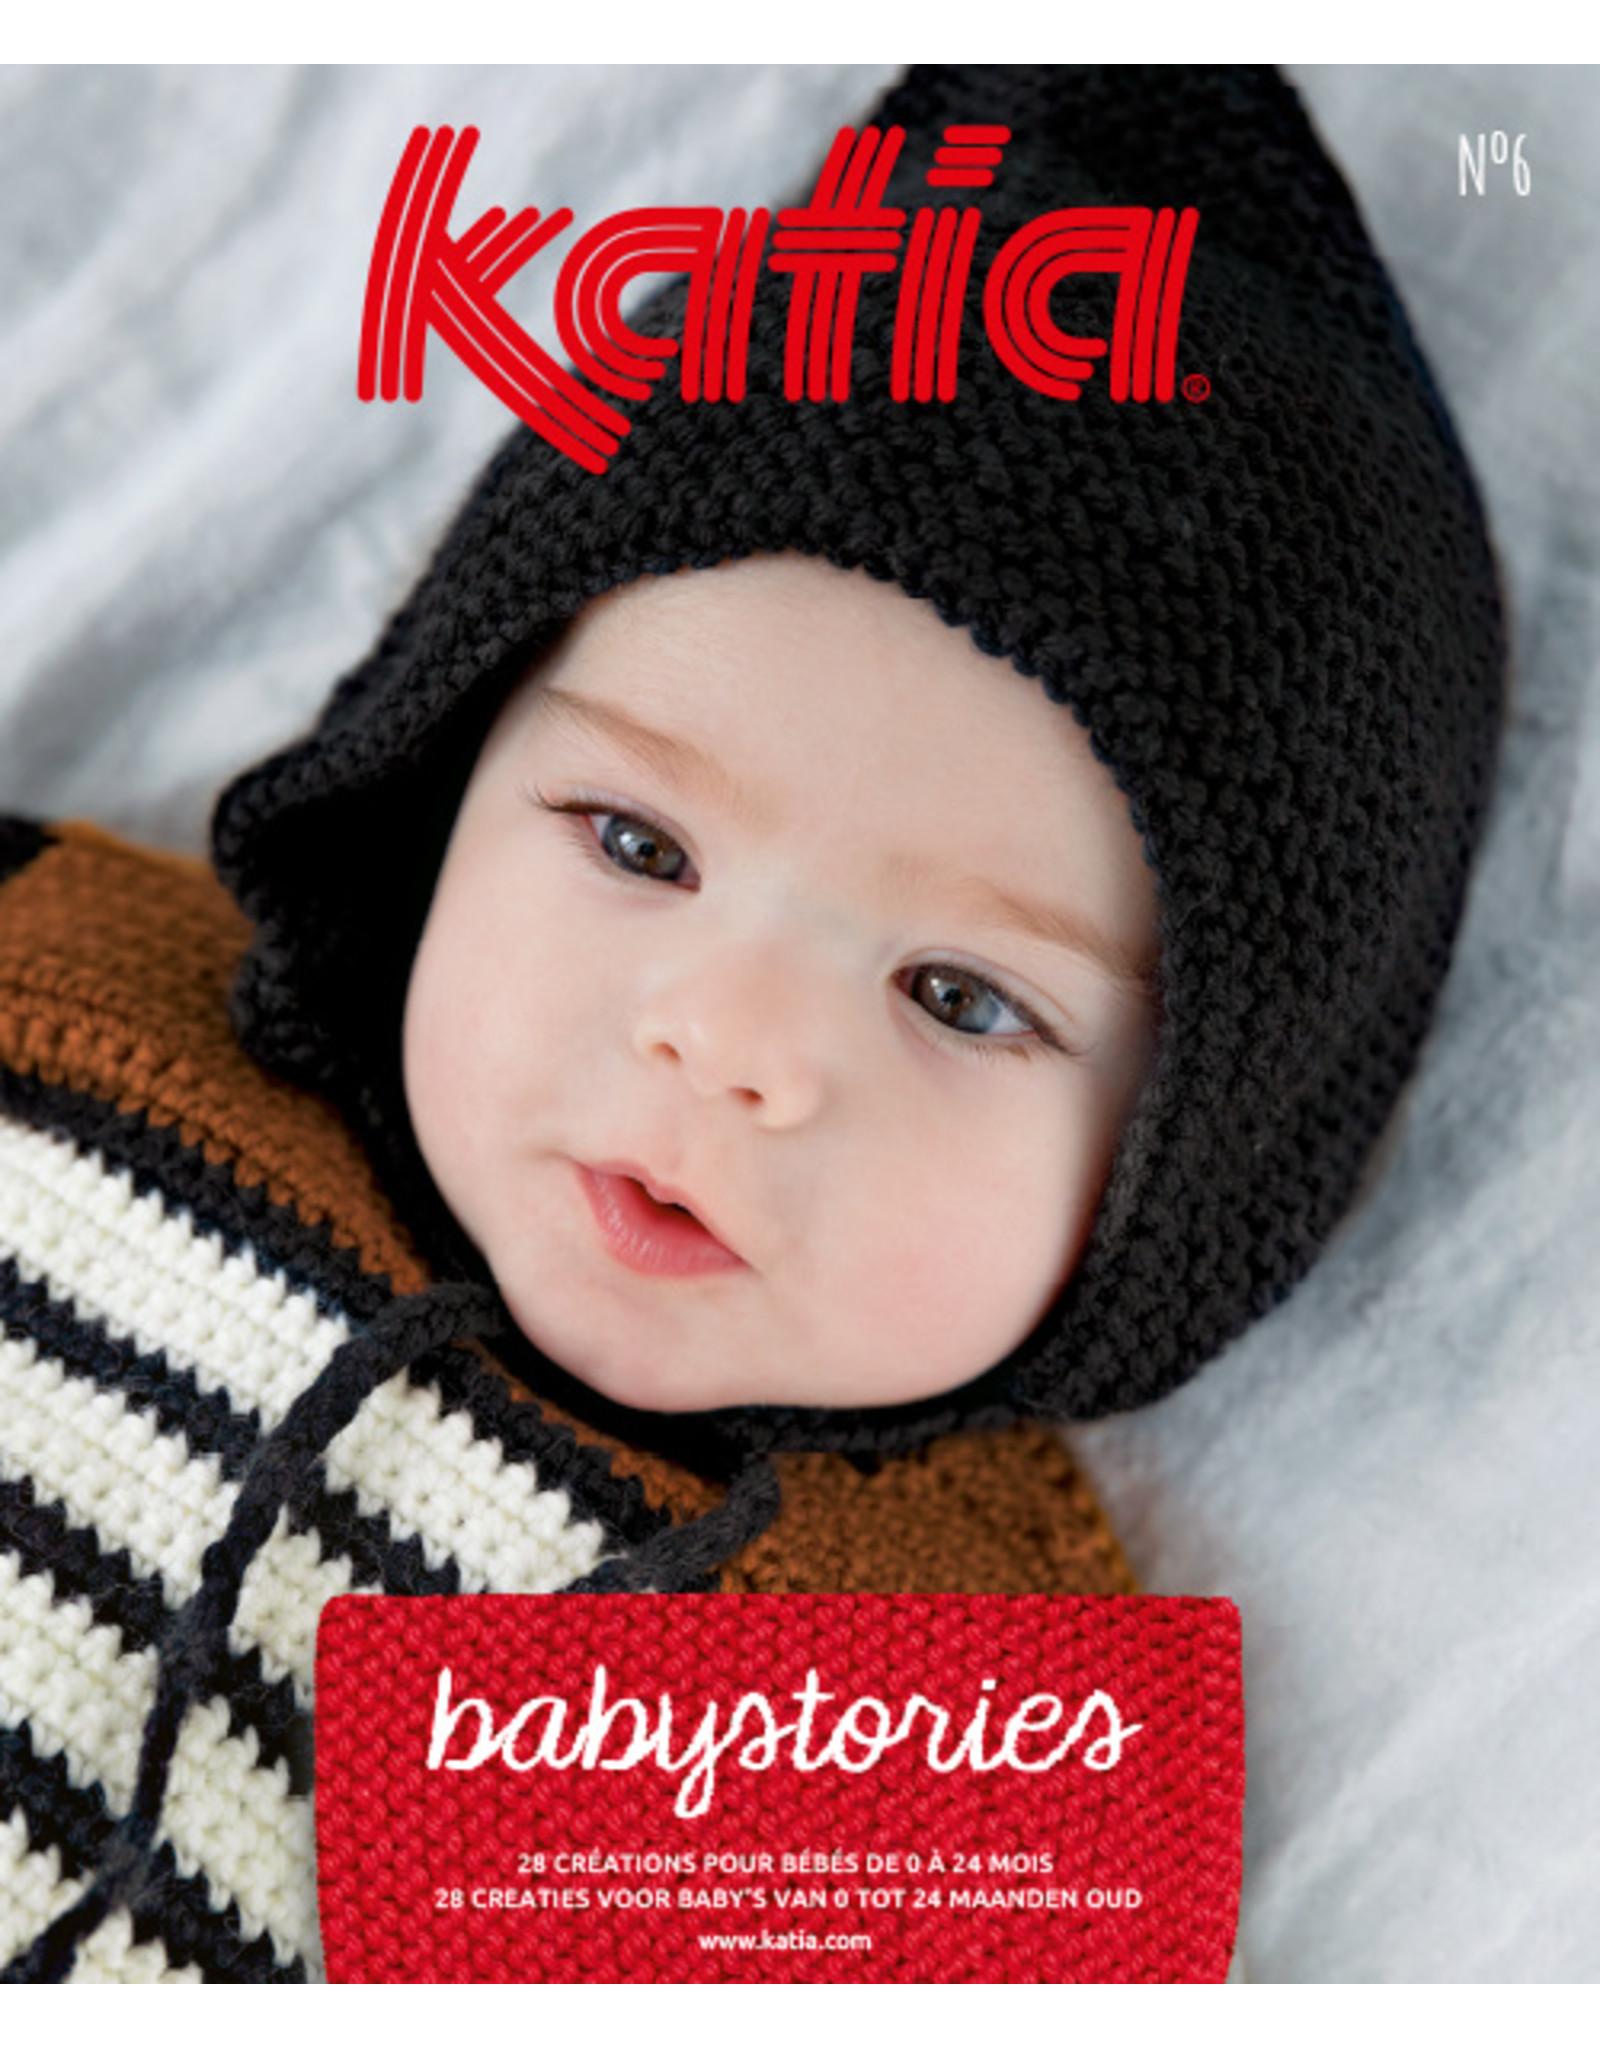 Katia Katia Baby Babystories 6